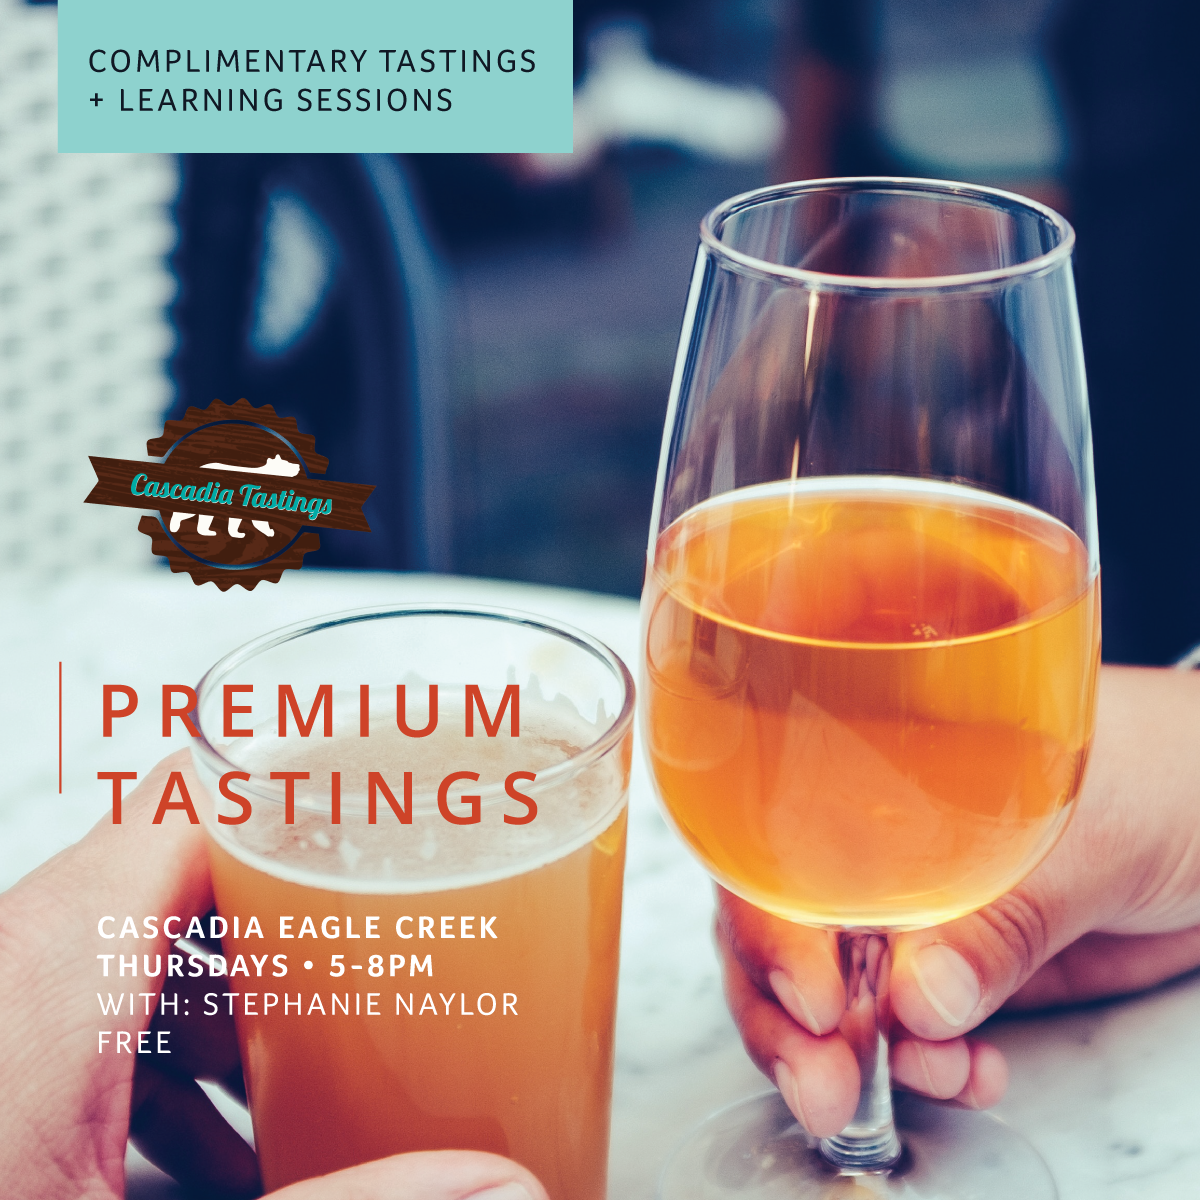 Cascadia Eagle Creek Premium Tastings Oct 2018_web.png